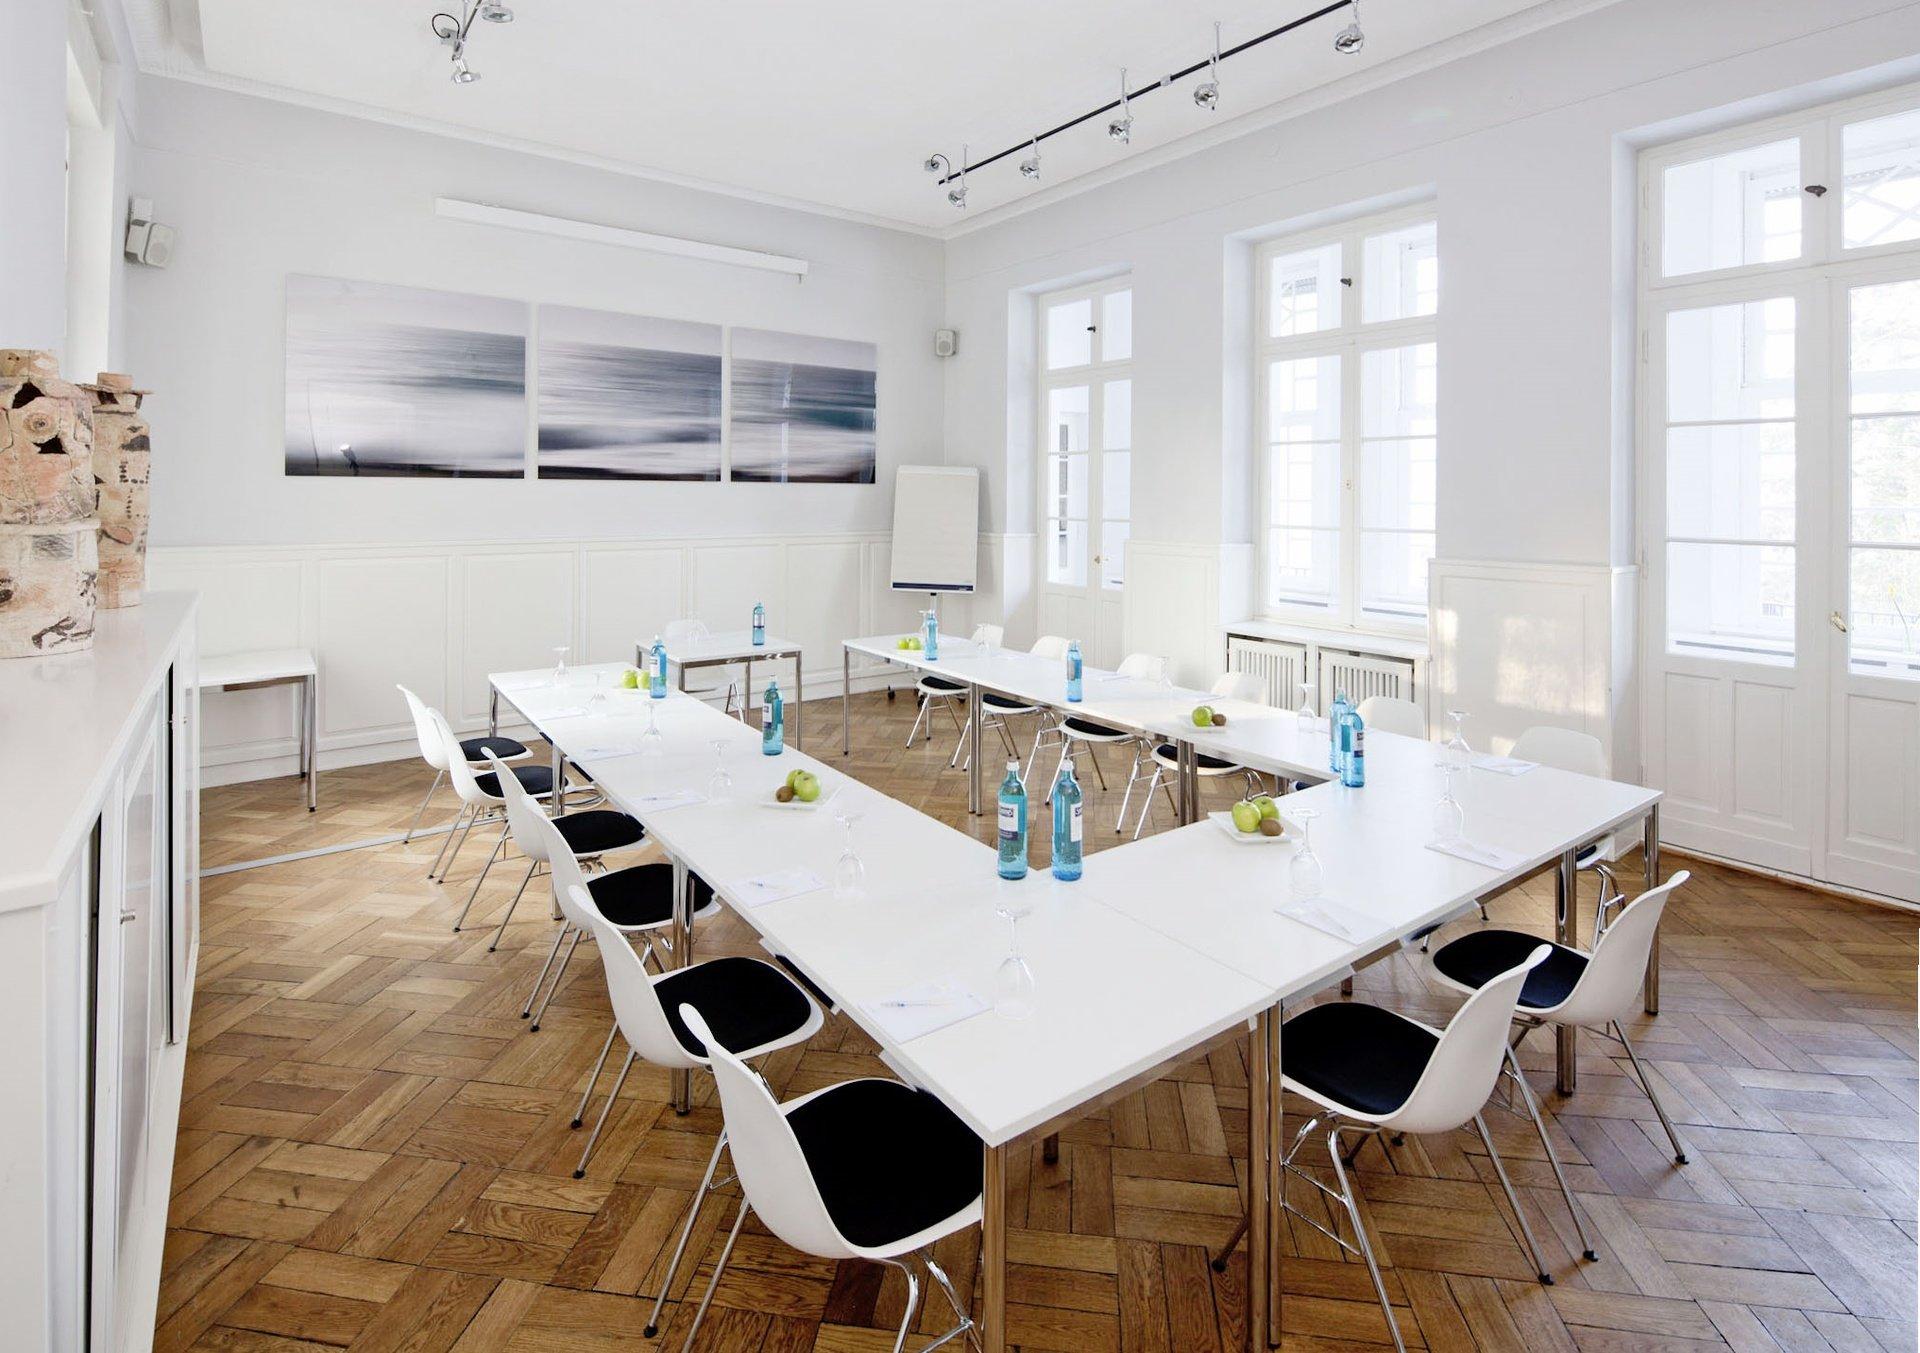 Berlin seminar rooms Meetingraum Villa Blumenfisch - Tagungsraum Zauberberg image 0